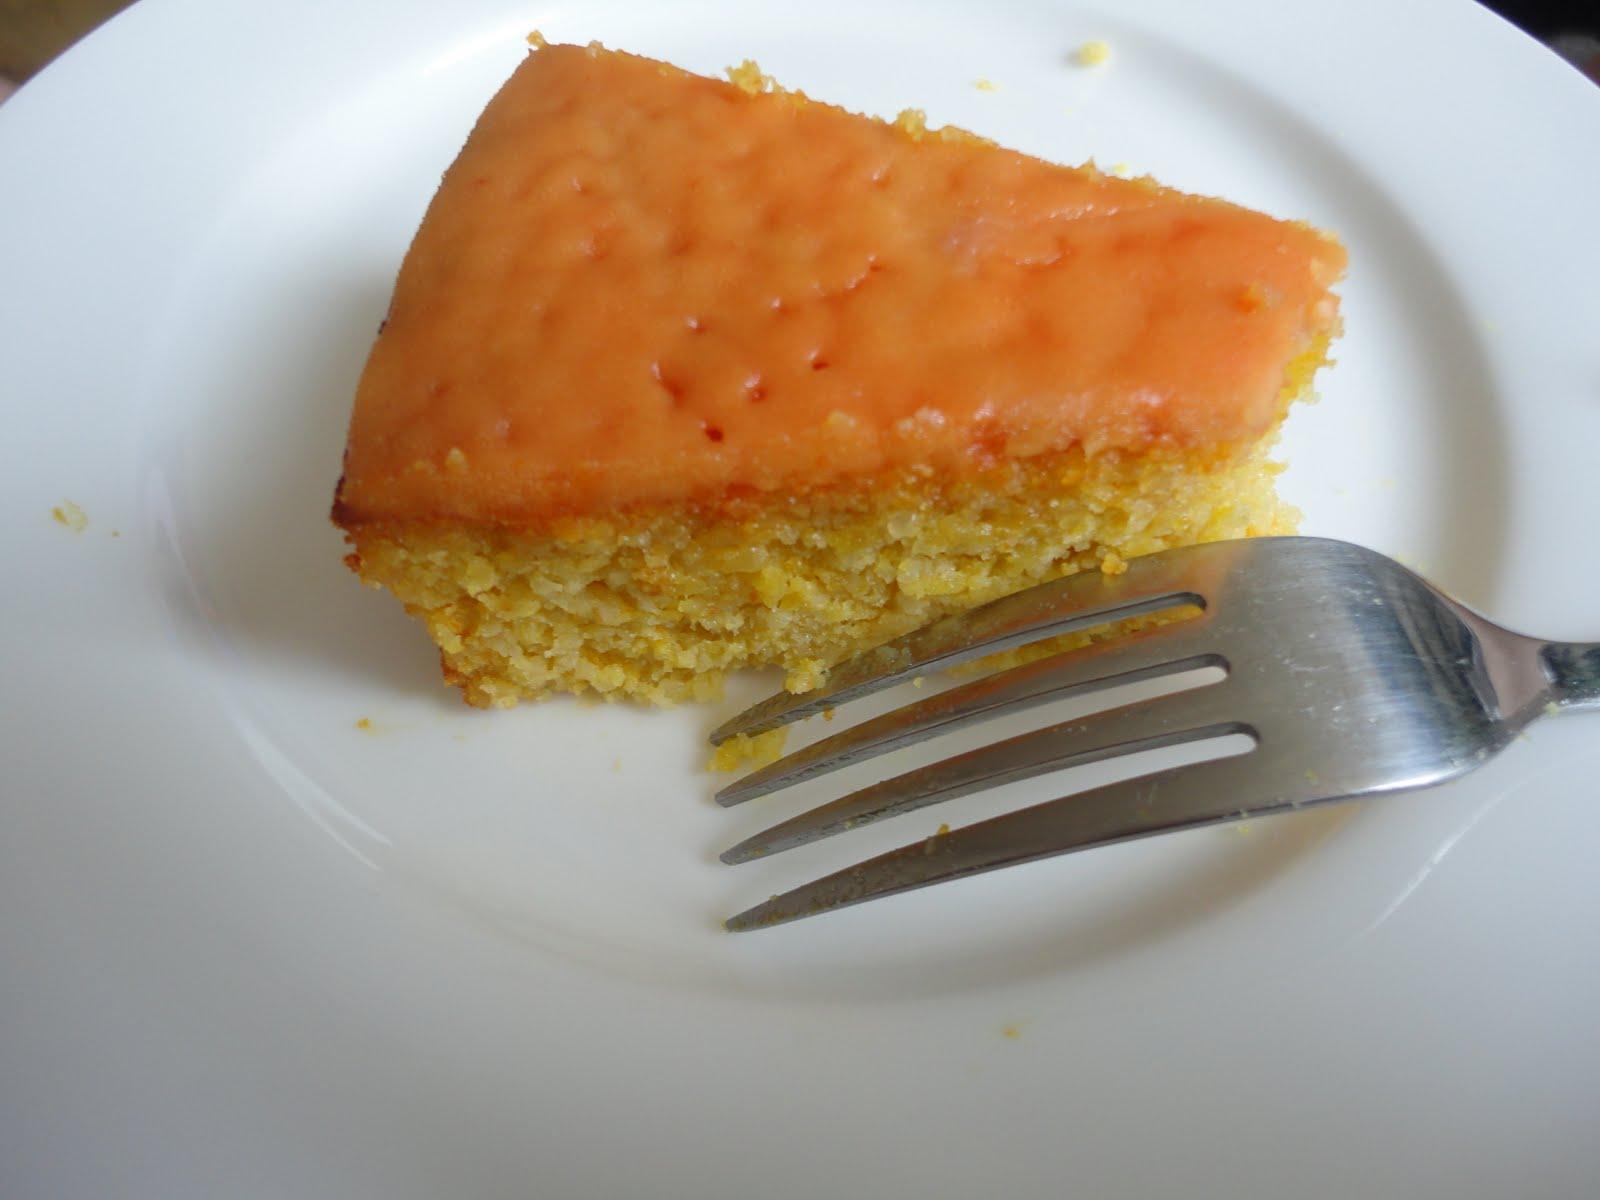 Swans place: Flourless Orange Cake